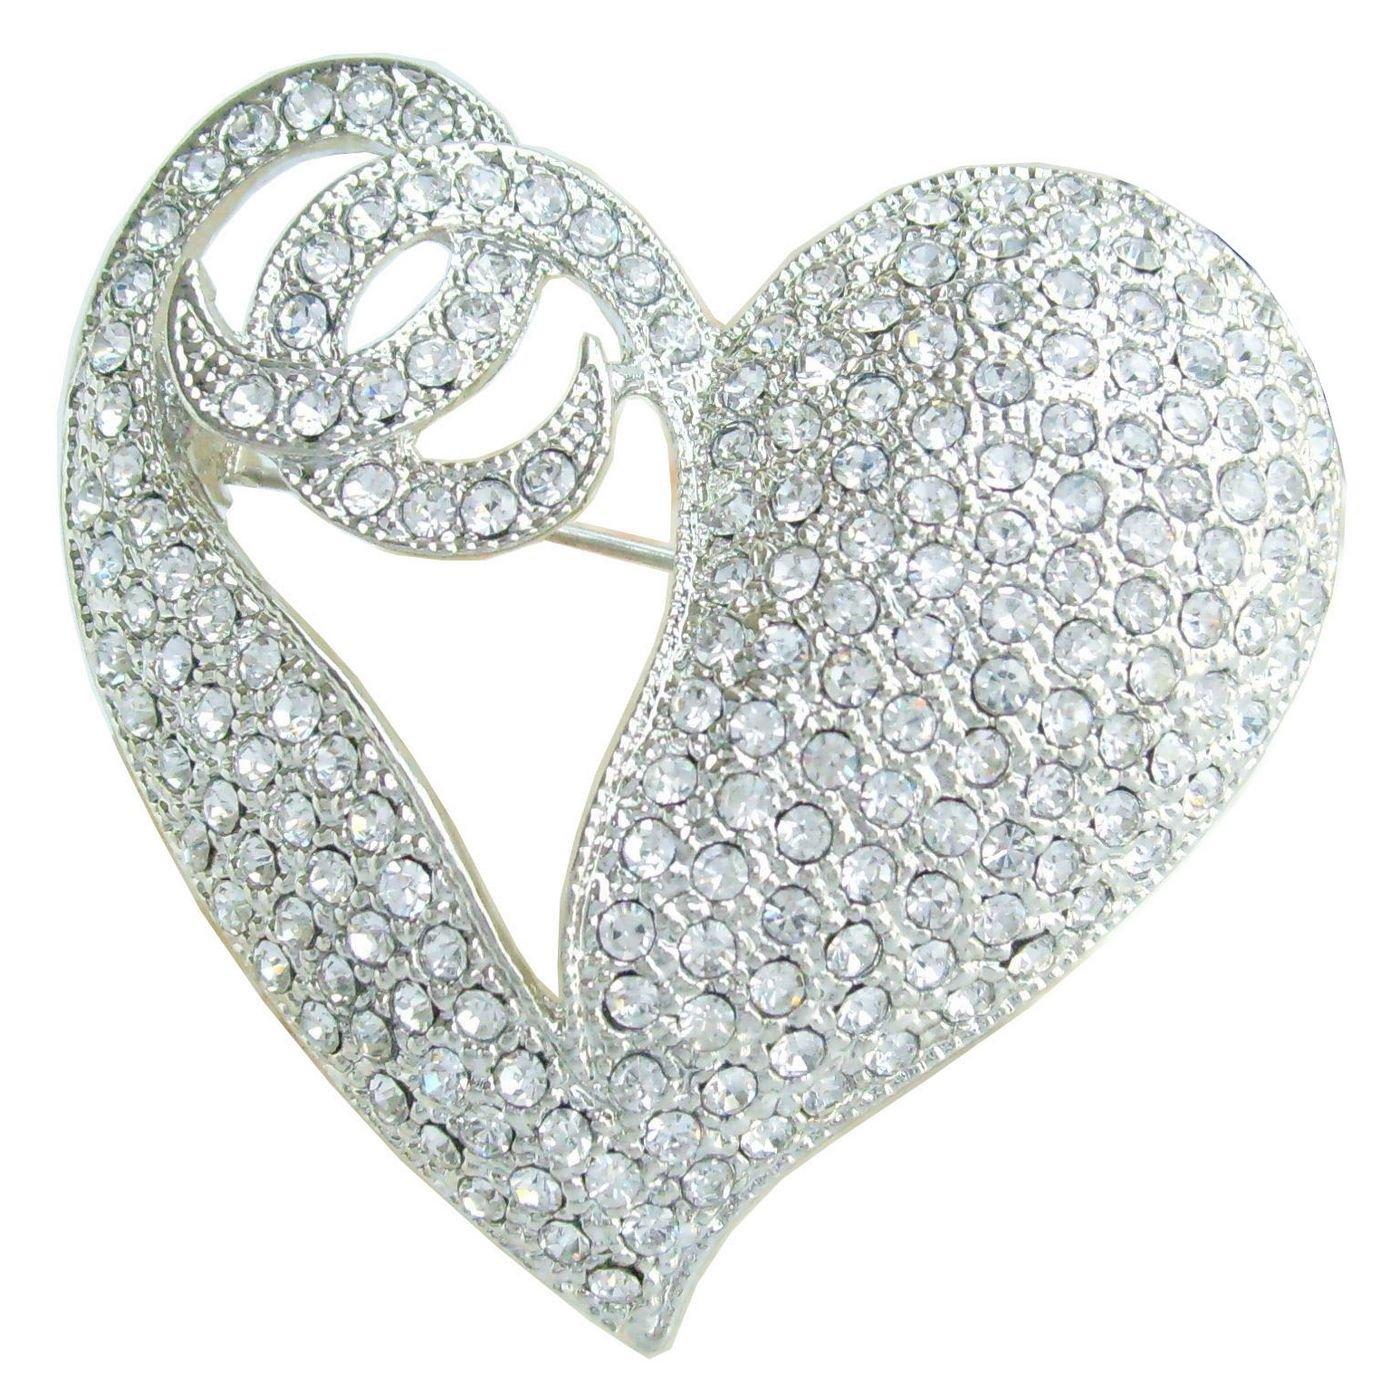 1.97'' Rhinestone Crystal Love Heart Brooch Pin Pendant BZ4831 (Silver-Tone Clear)